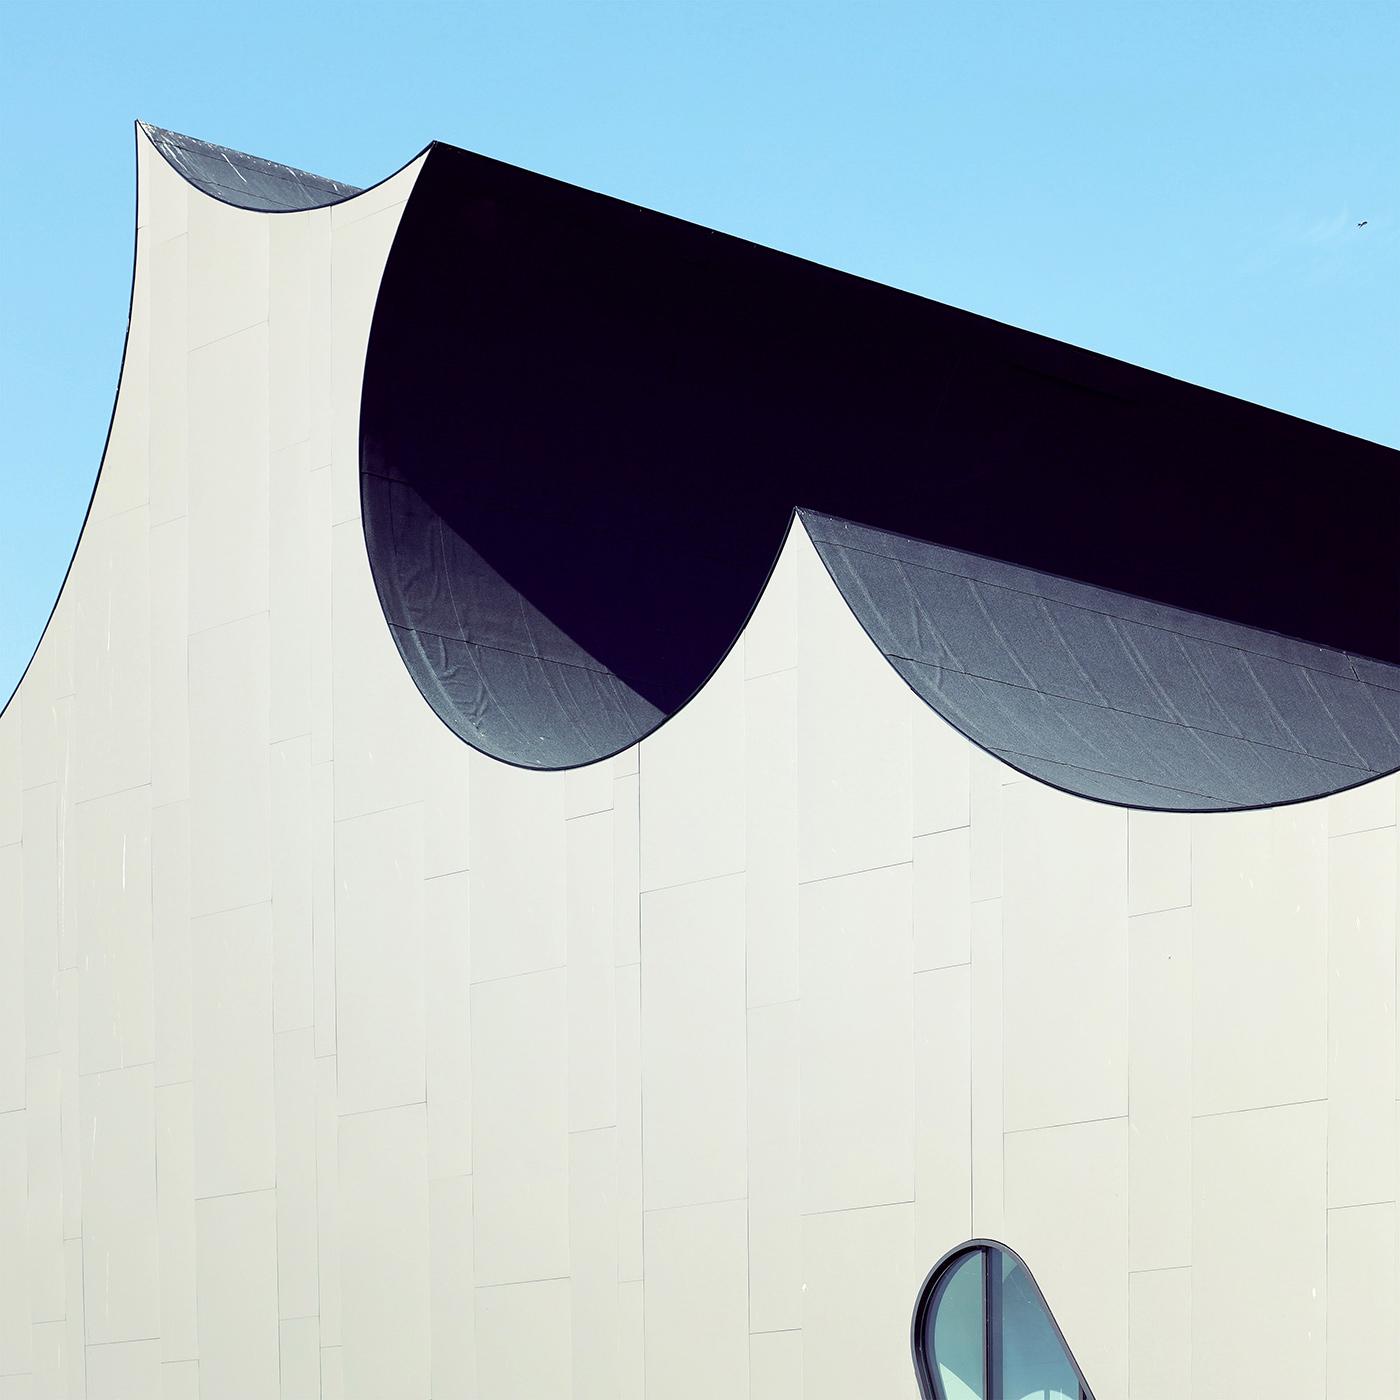 Danfoss Universe <br />Location: Nordborg, Denmark <br />Architects: J. Mayer H. Architects